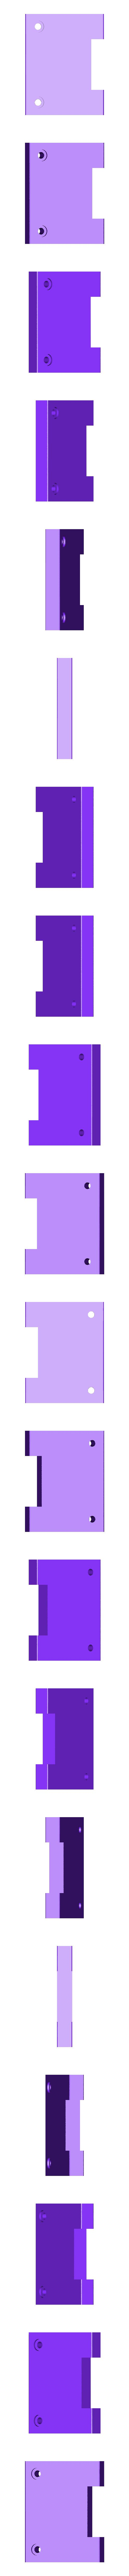 Side_Leg-Print_two_of_these.stl Download free STL file Linear Rail Eggbot • Object to 3D print, 8ran